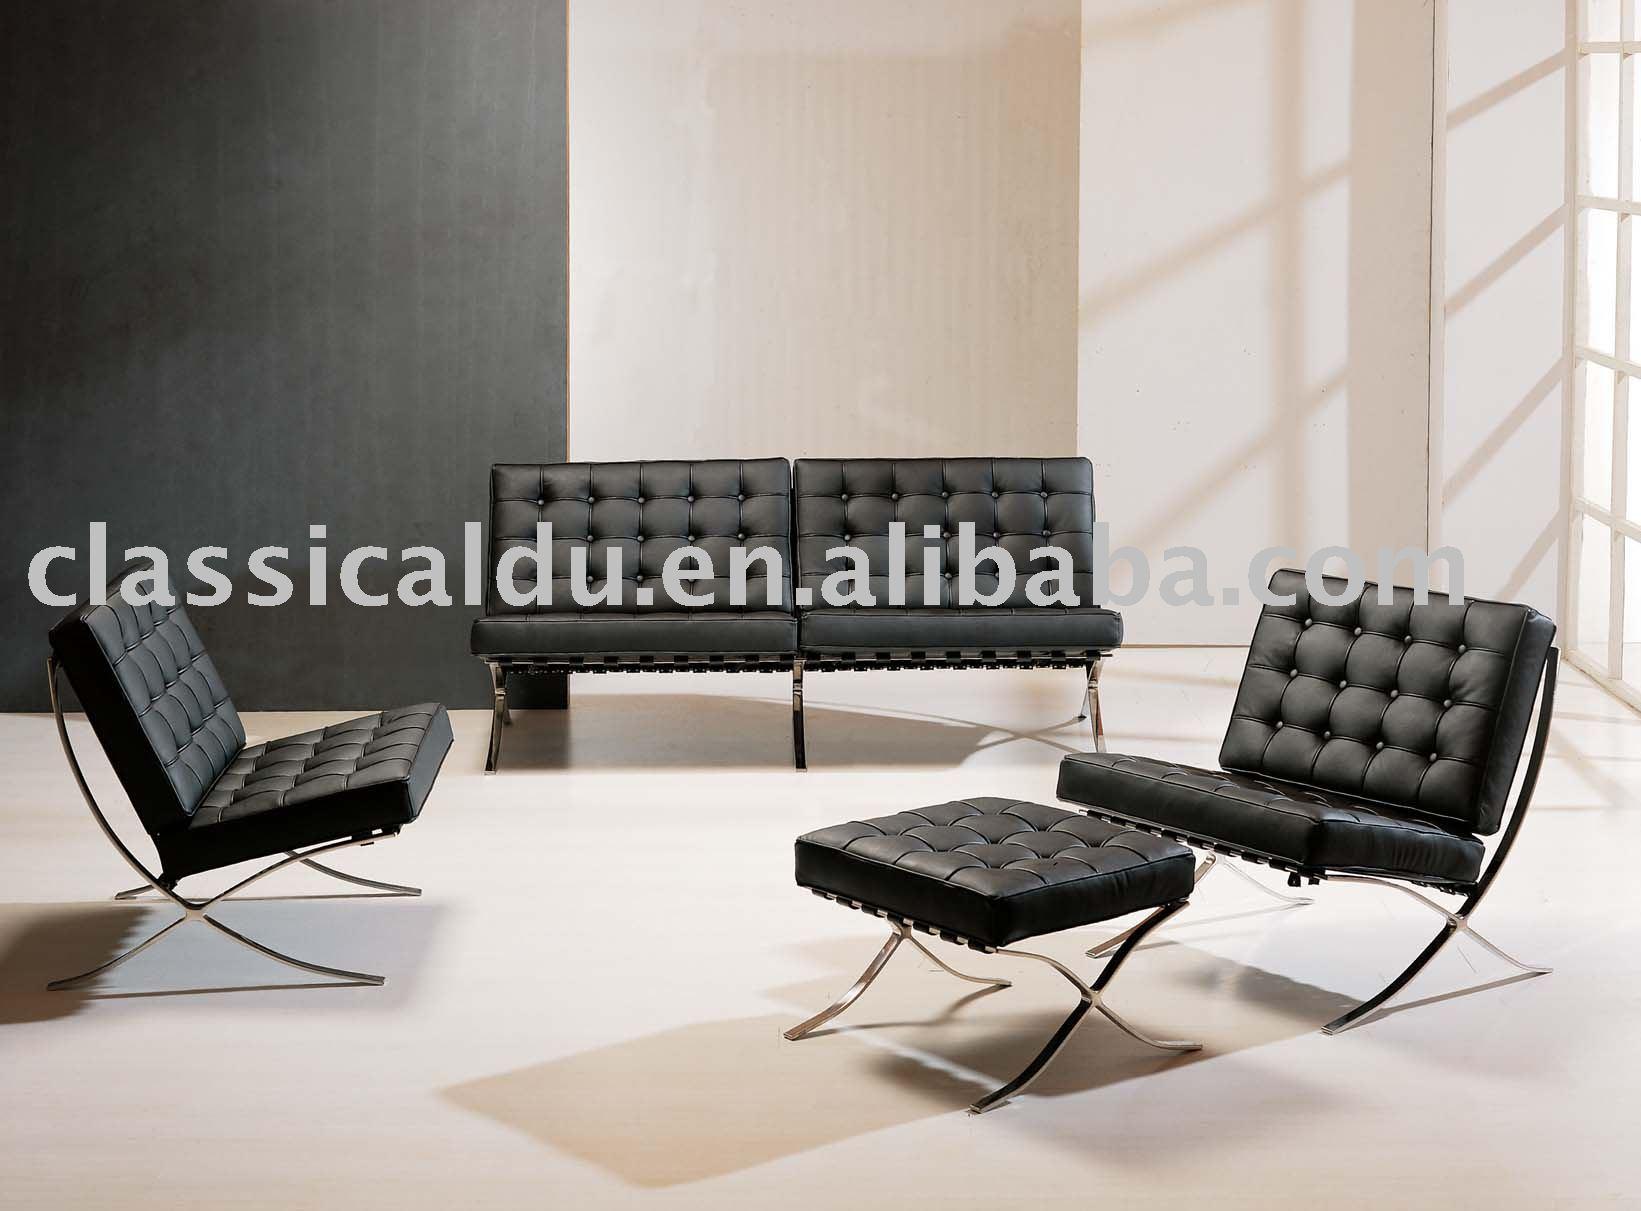 Cuero moderno sof barcelona sofa lounge chair sf 505 for Sofas modernos barcelona